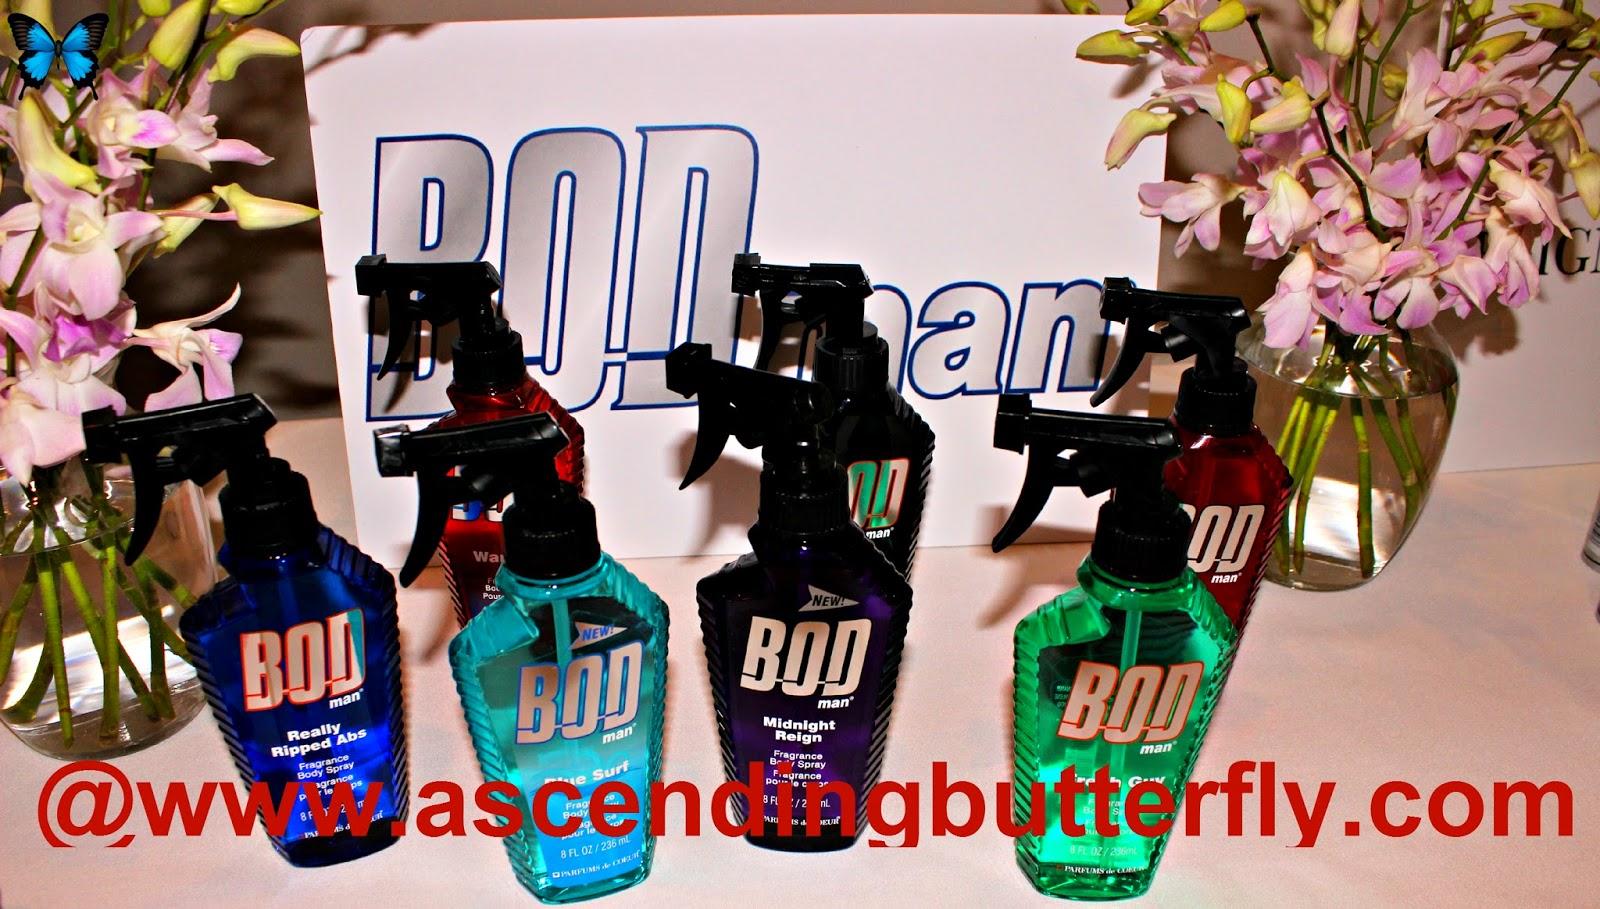 Bod Man at Getting Gorgeous 2014, Fragrance Rebel, parfums de coeur